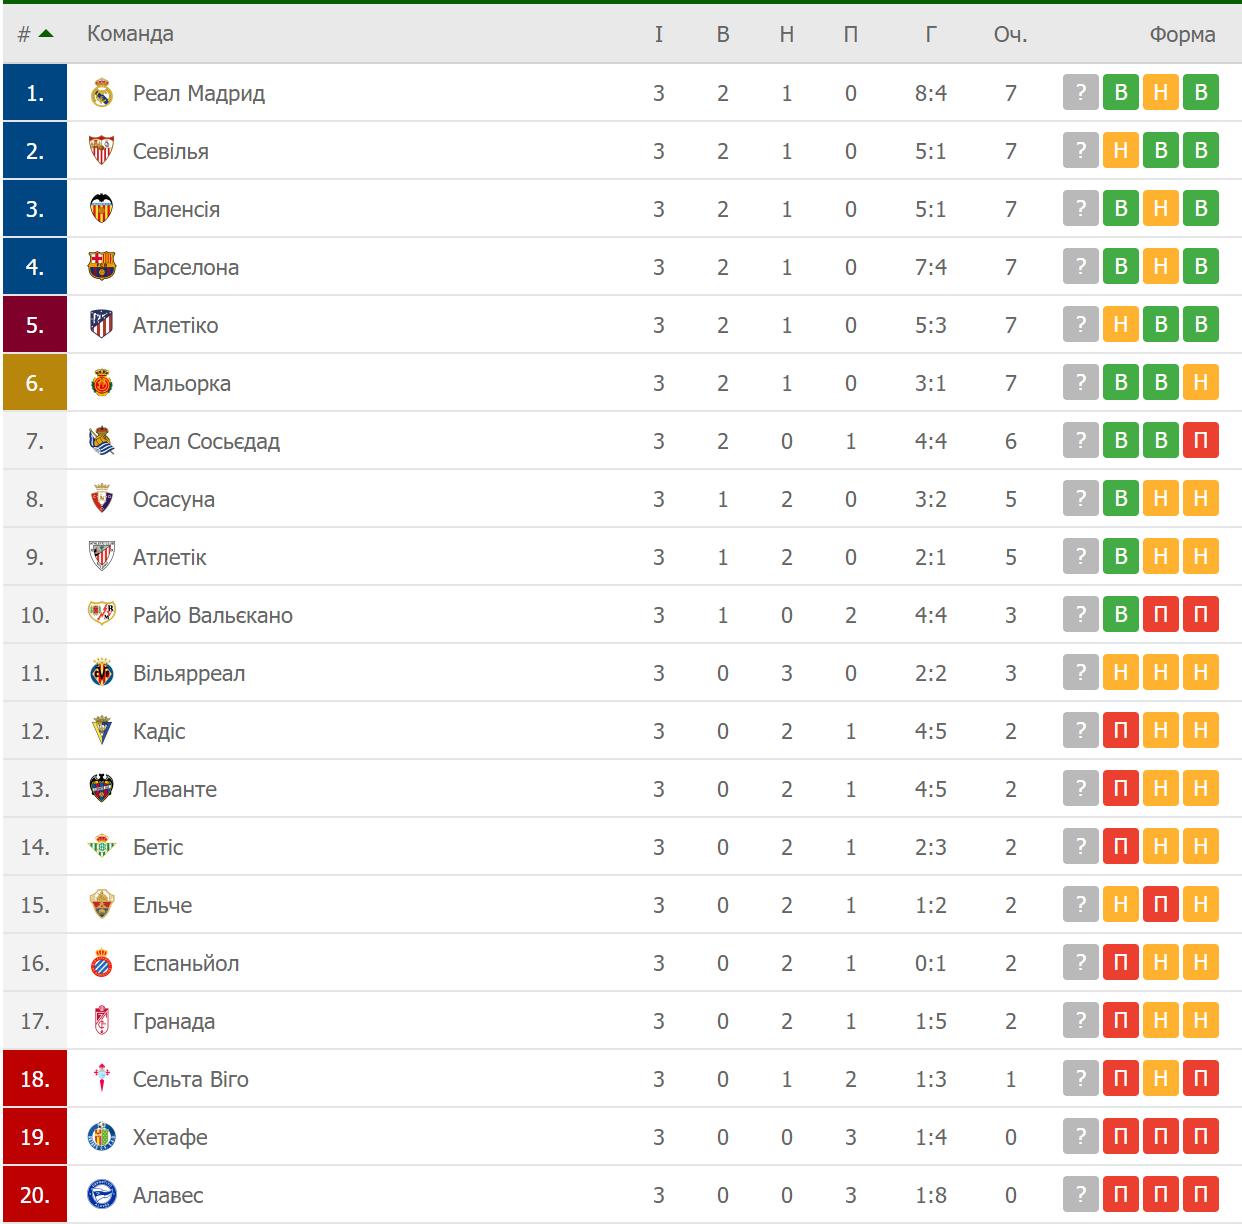 Таблица испанской Ла Лиги